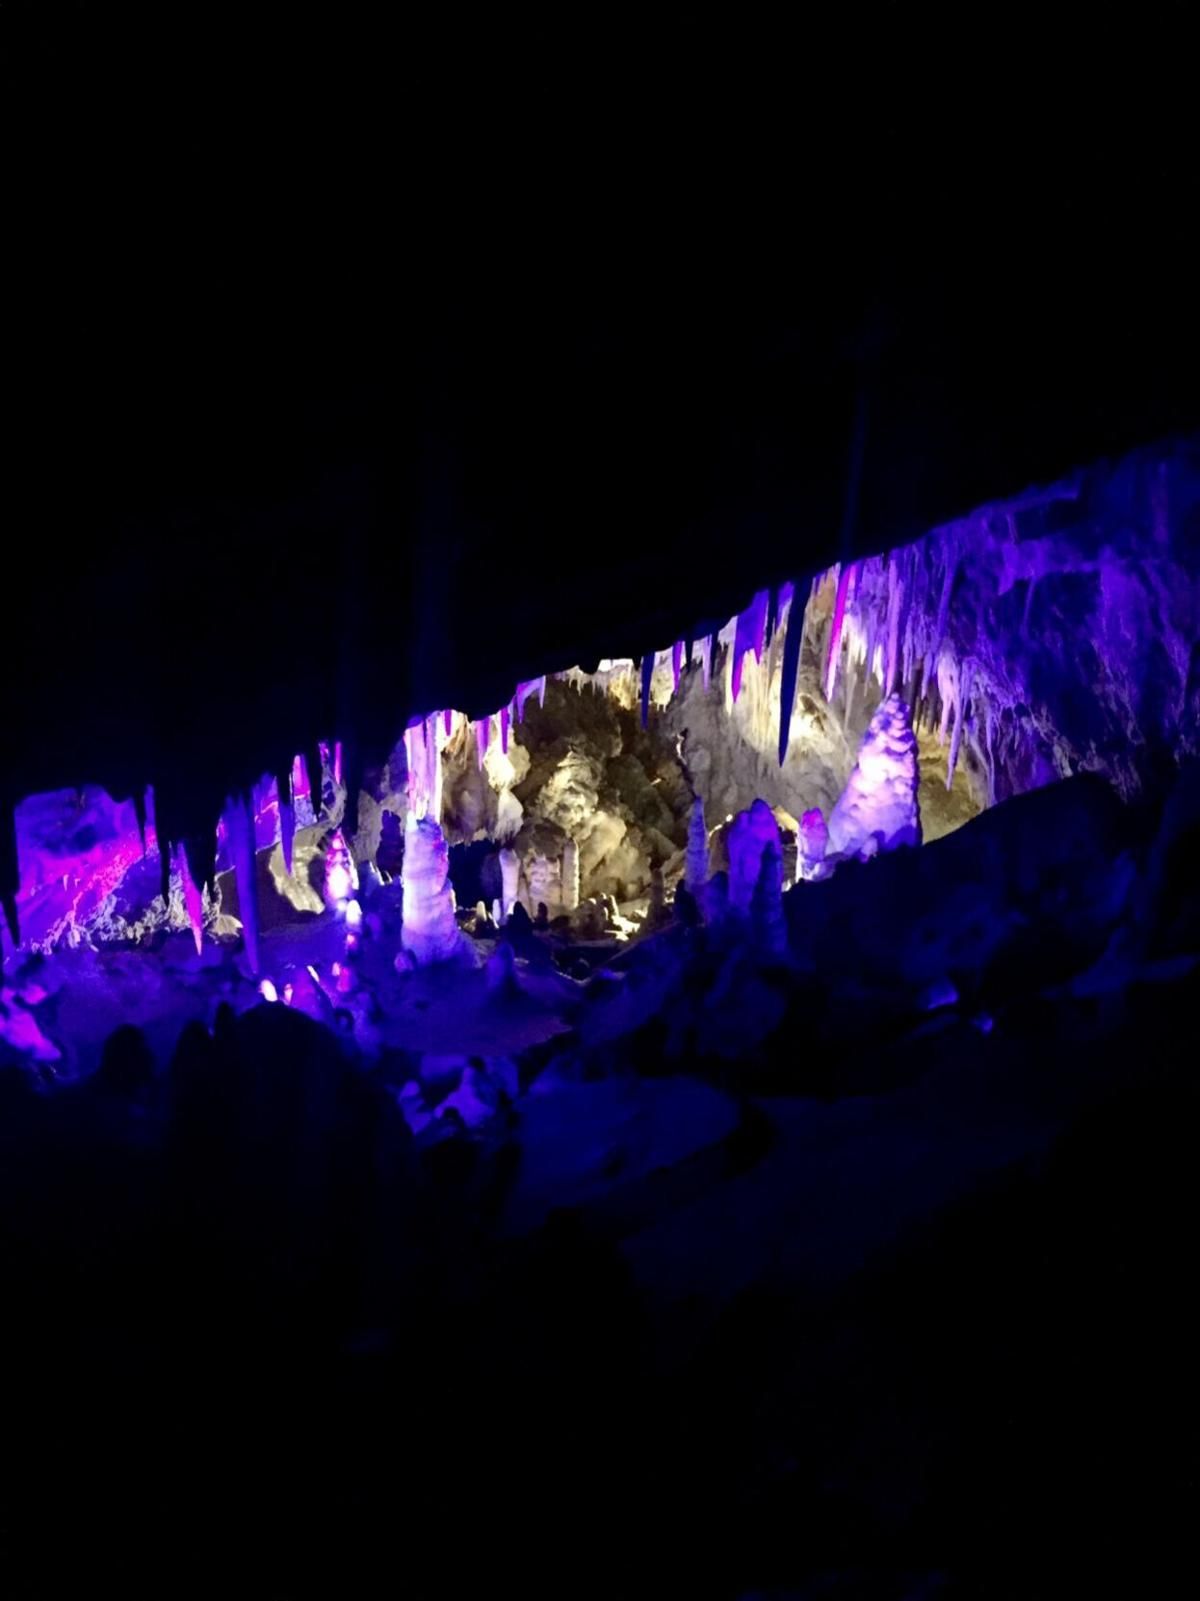 A shot taken during the Glenwood Caverns cave tour. Photo Credit: Spencer McKee